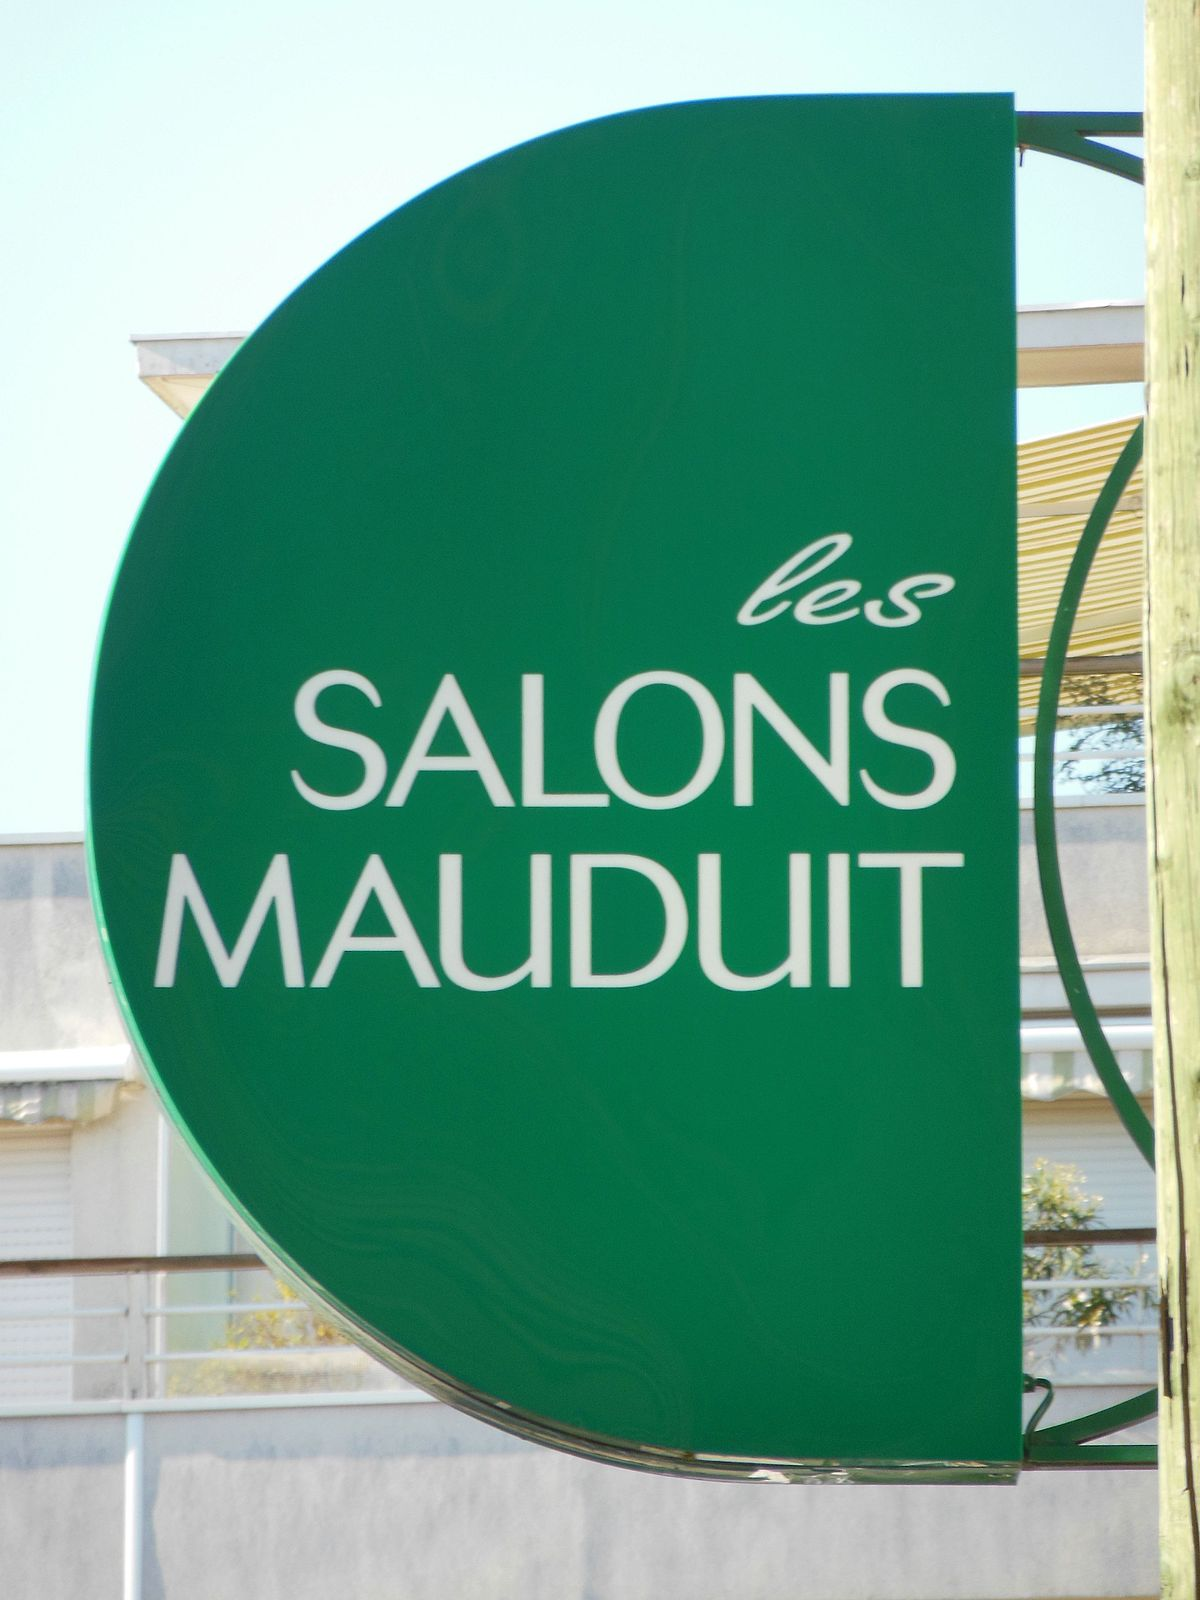 Salons Mauduit  U2014 Wikip U00e9dia